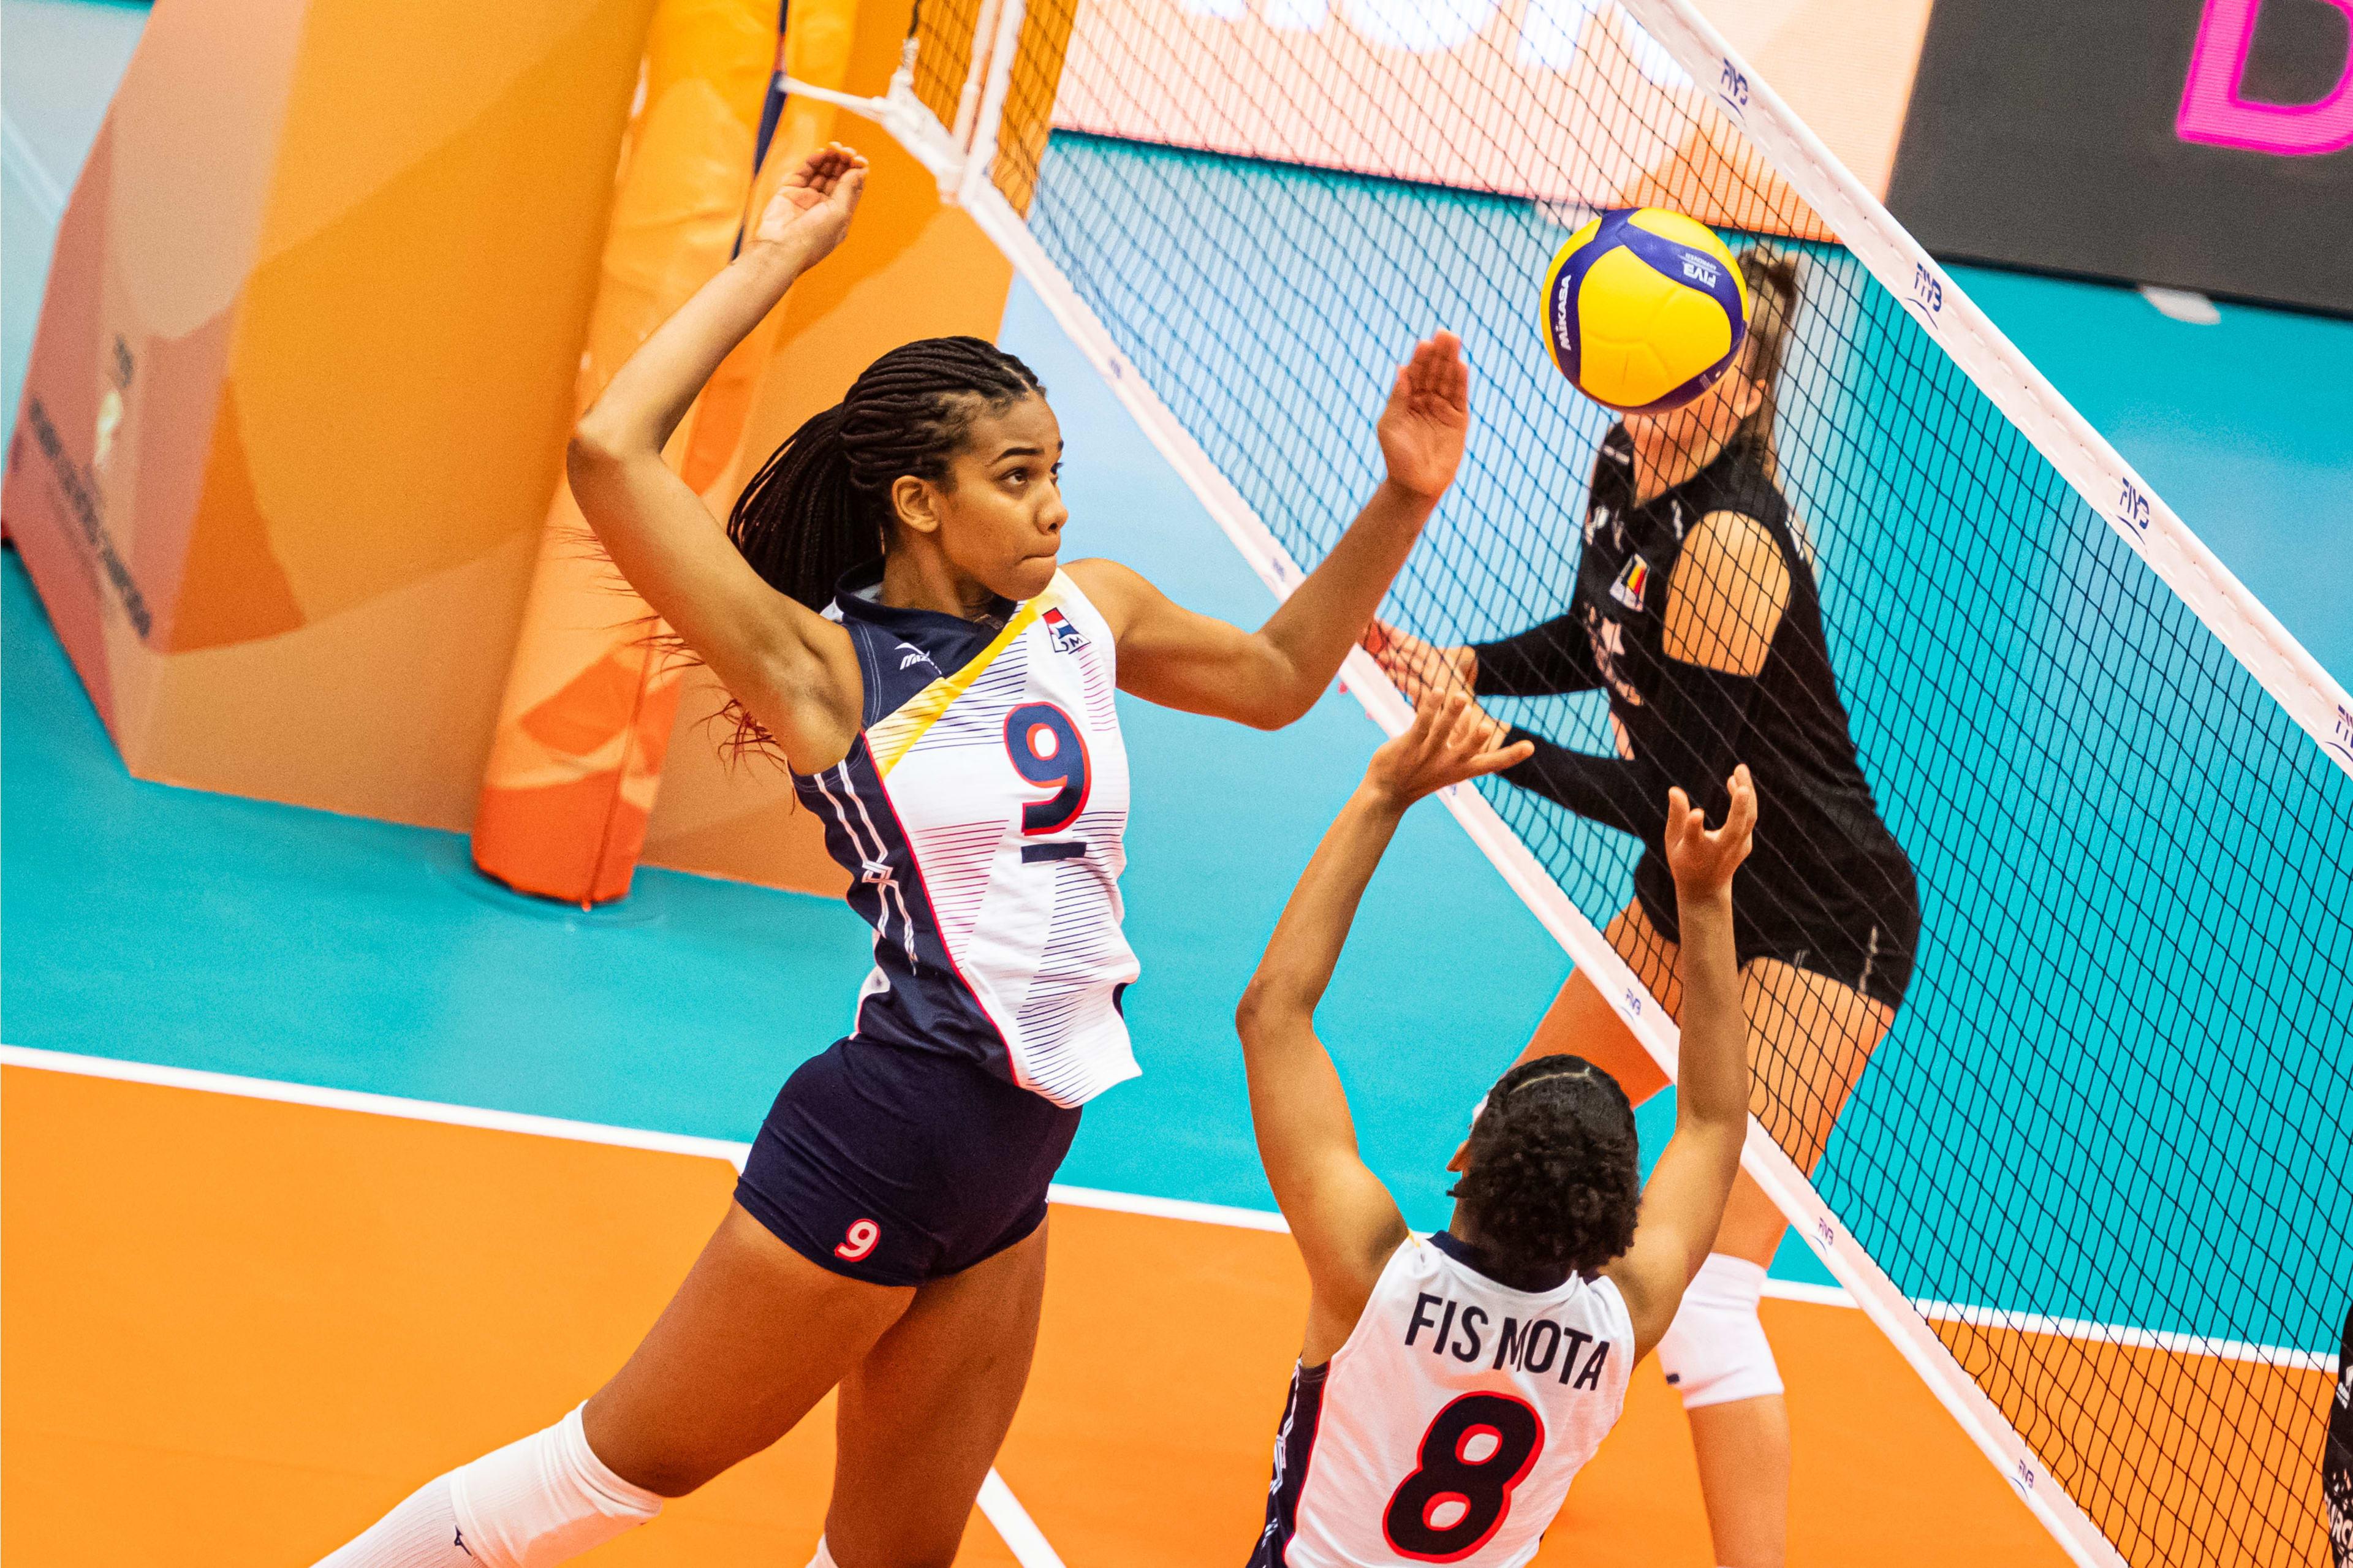 Voleibol RD vence a Bélgica en Mundial Voleibol Femenino Sub-20